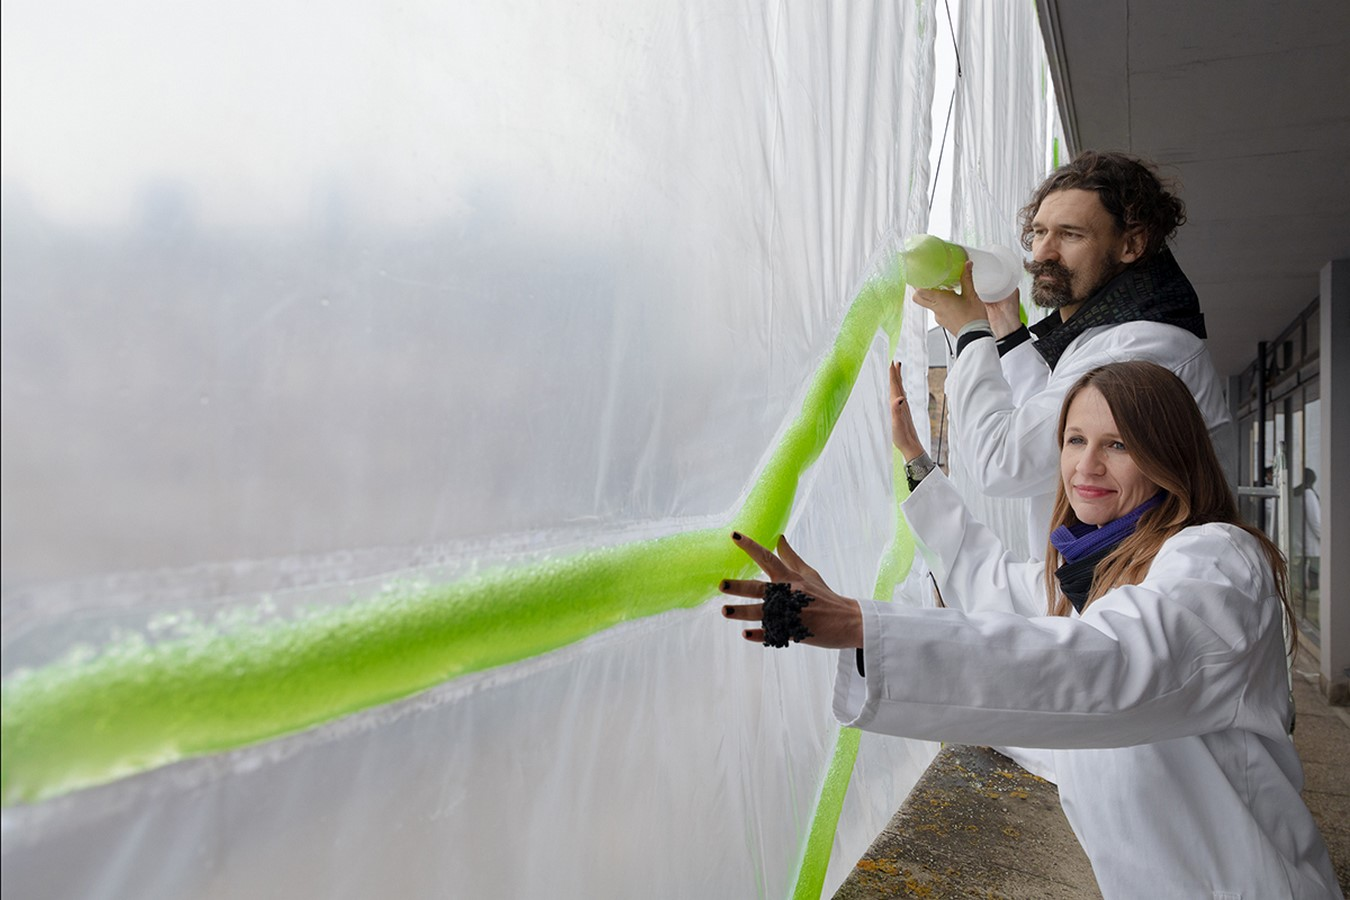 Bio-Digital Curtain filters air while creating Bioplastic - Sheet3